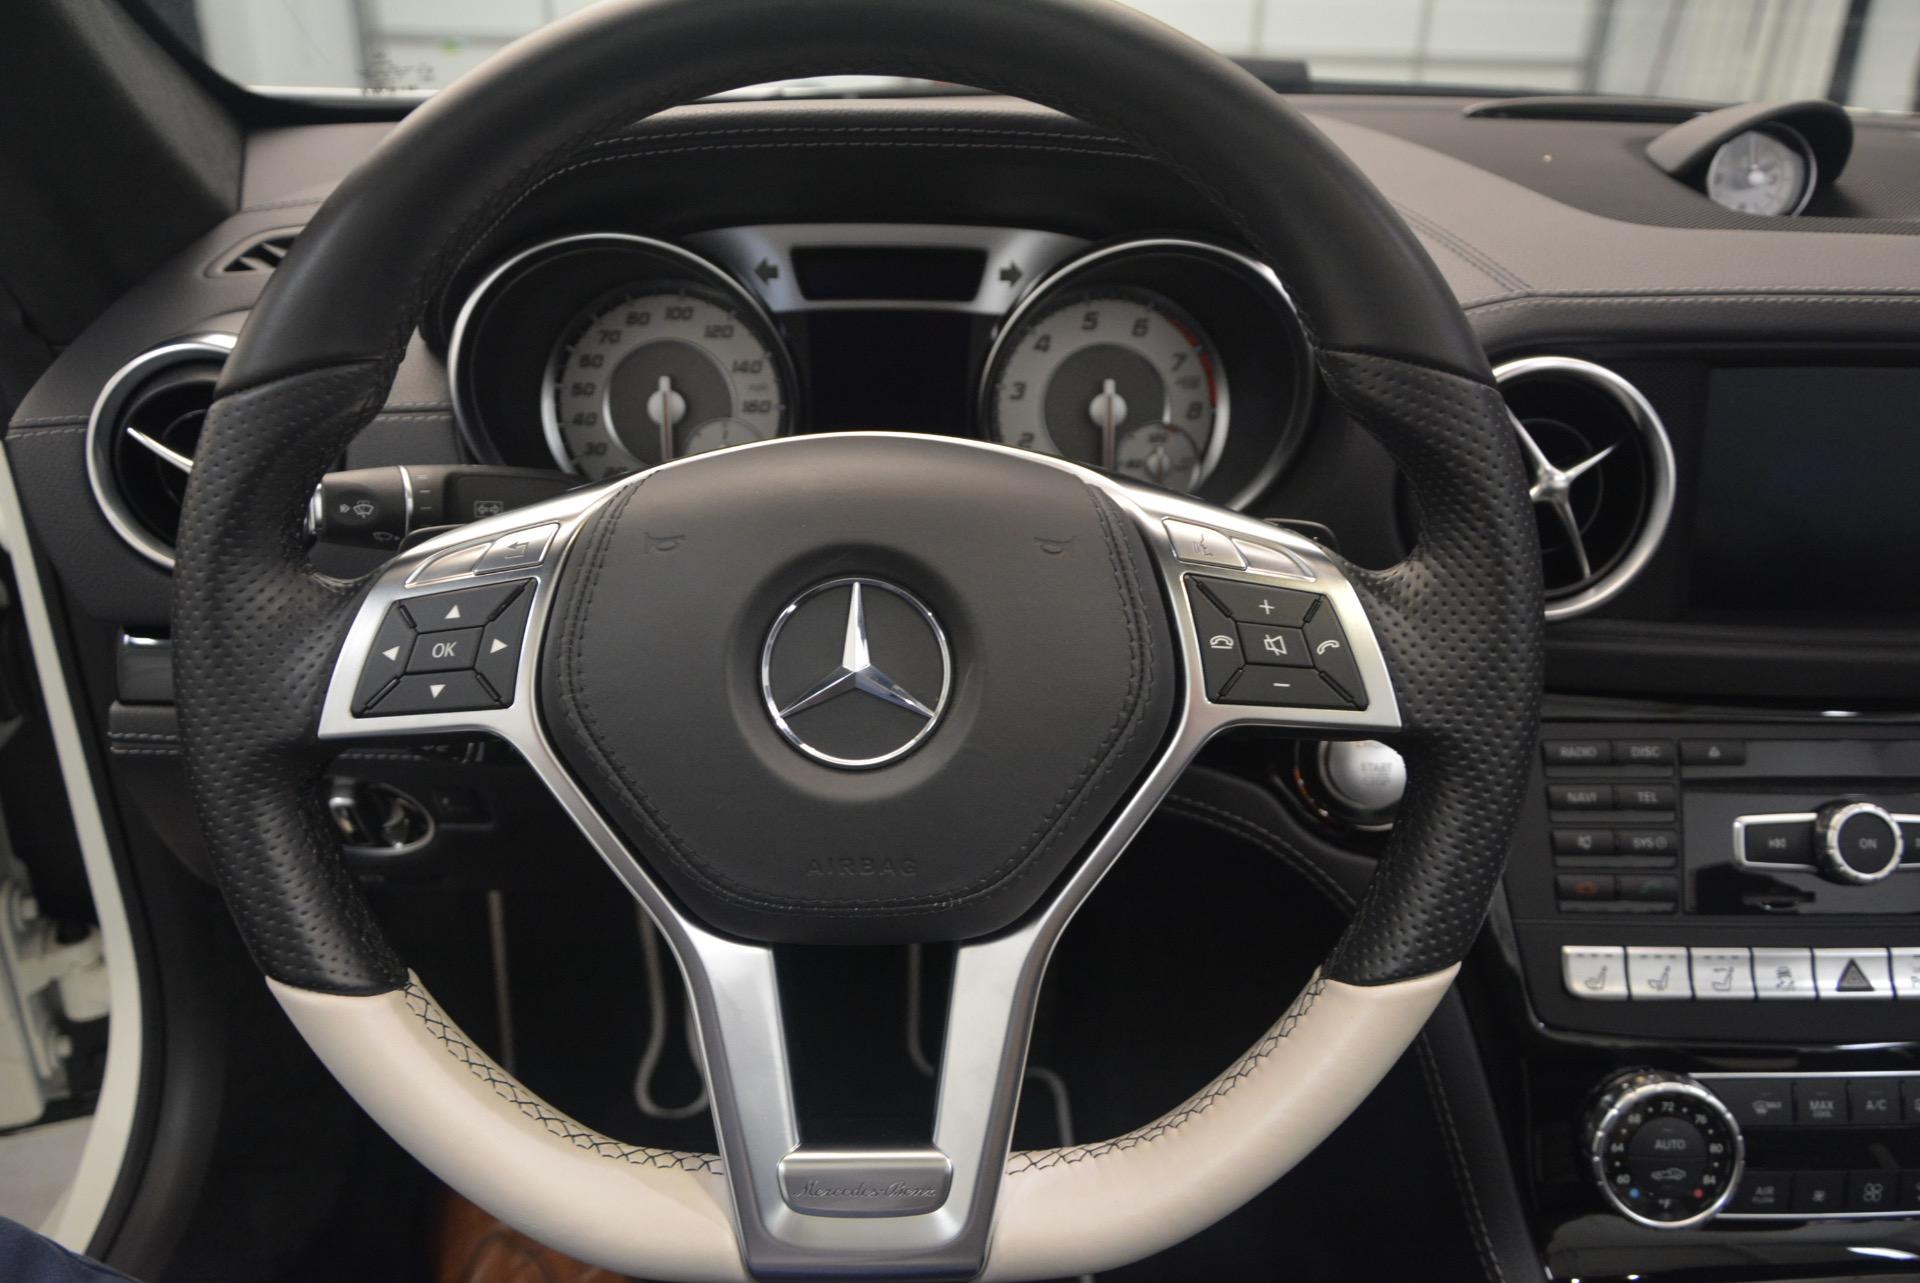 Used 2015 Mercedes Benz SL-Class SL 550 For Sale In Greenwich, CT. Alfa Romeo of Greenwich, M1874A 1261_p33